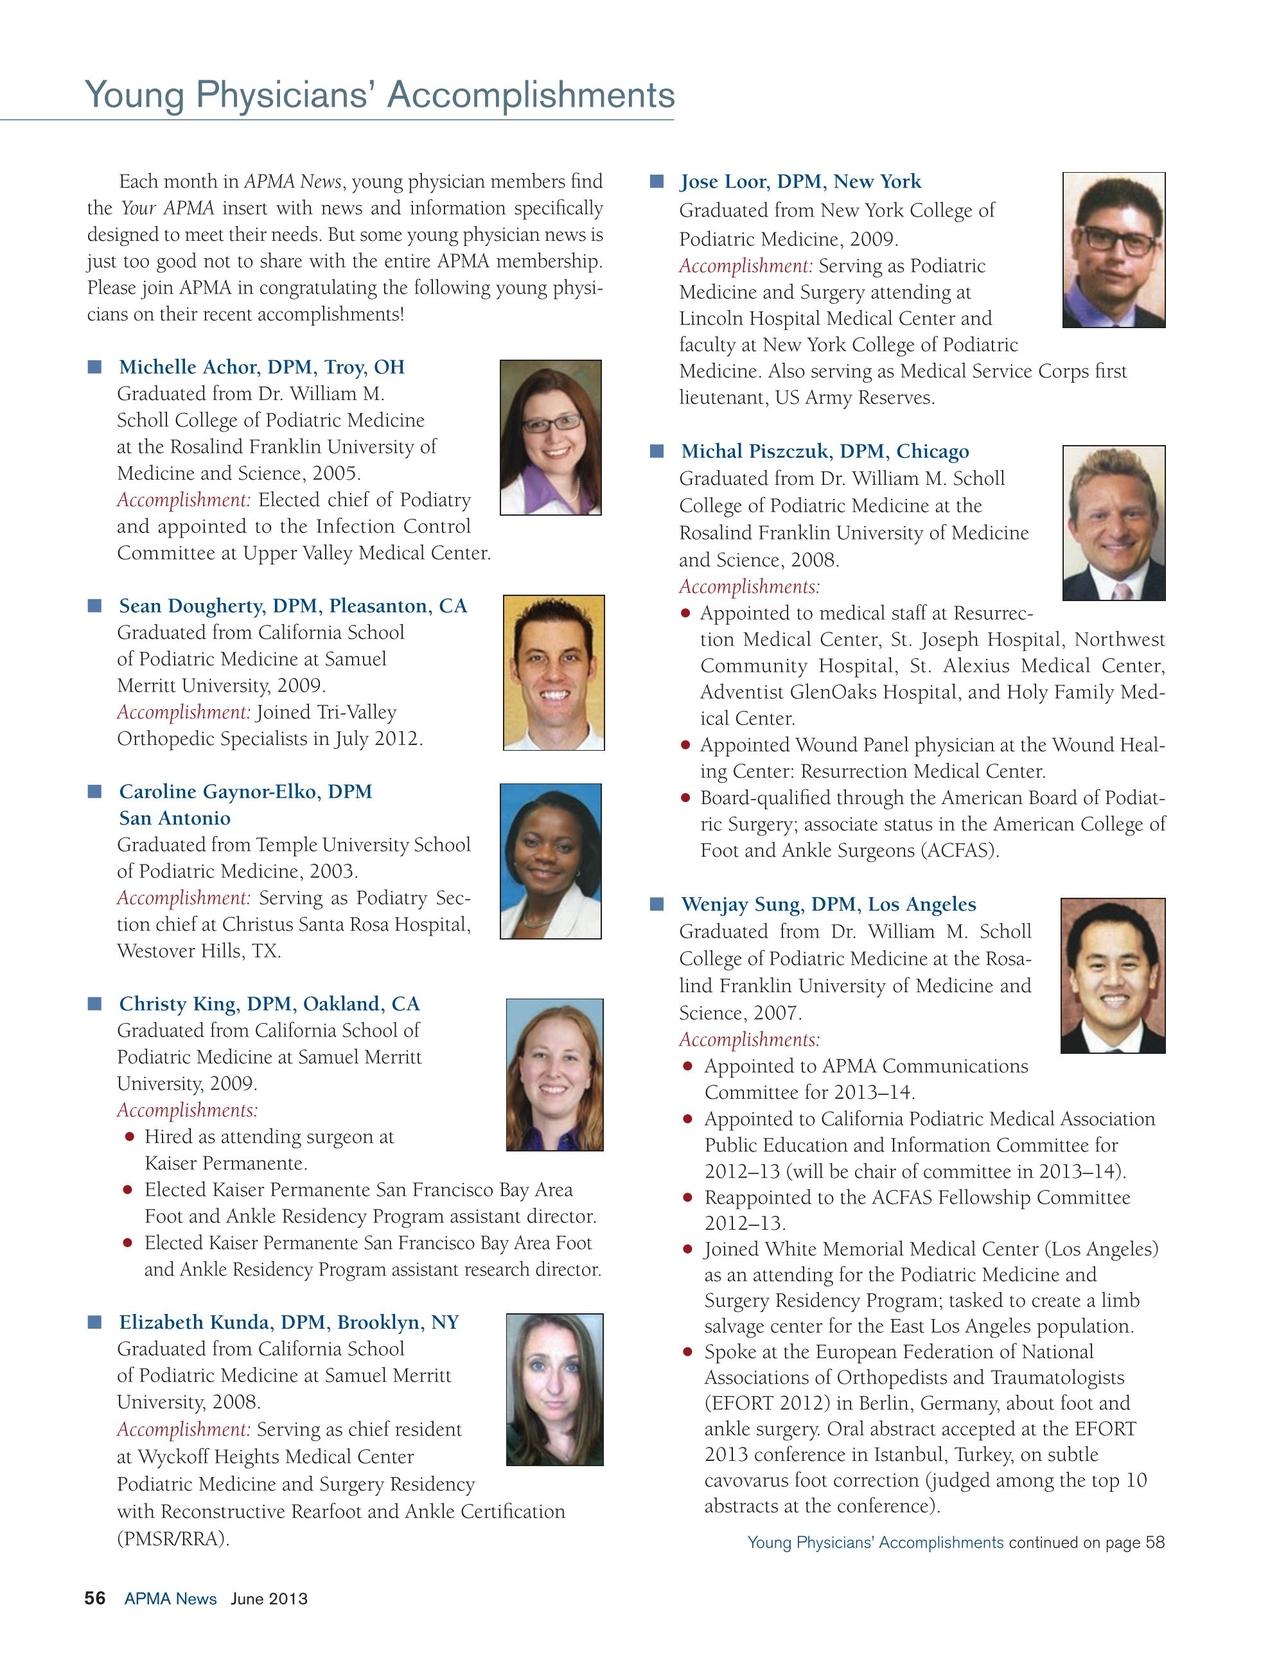 APMA News - June 2013